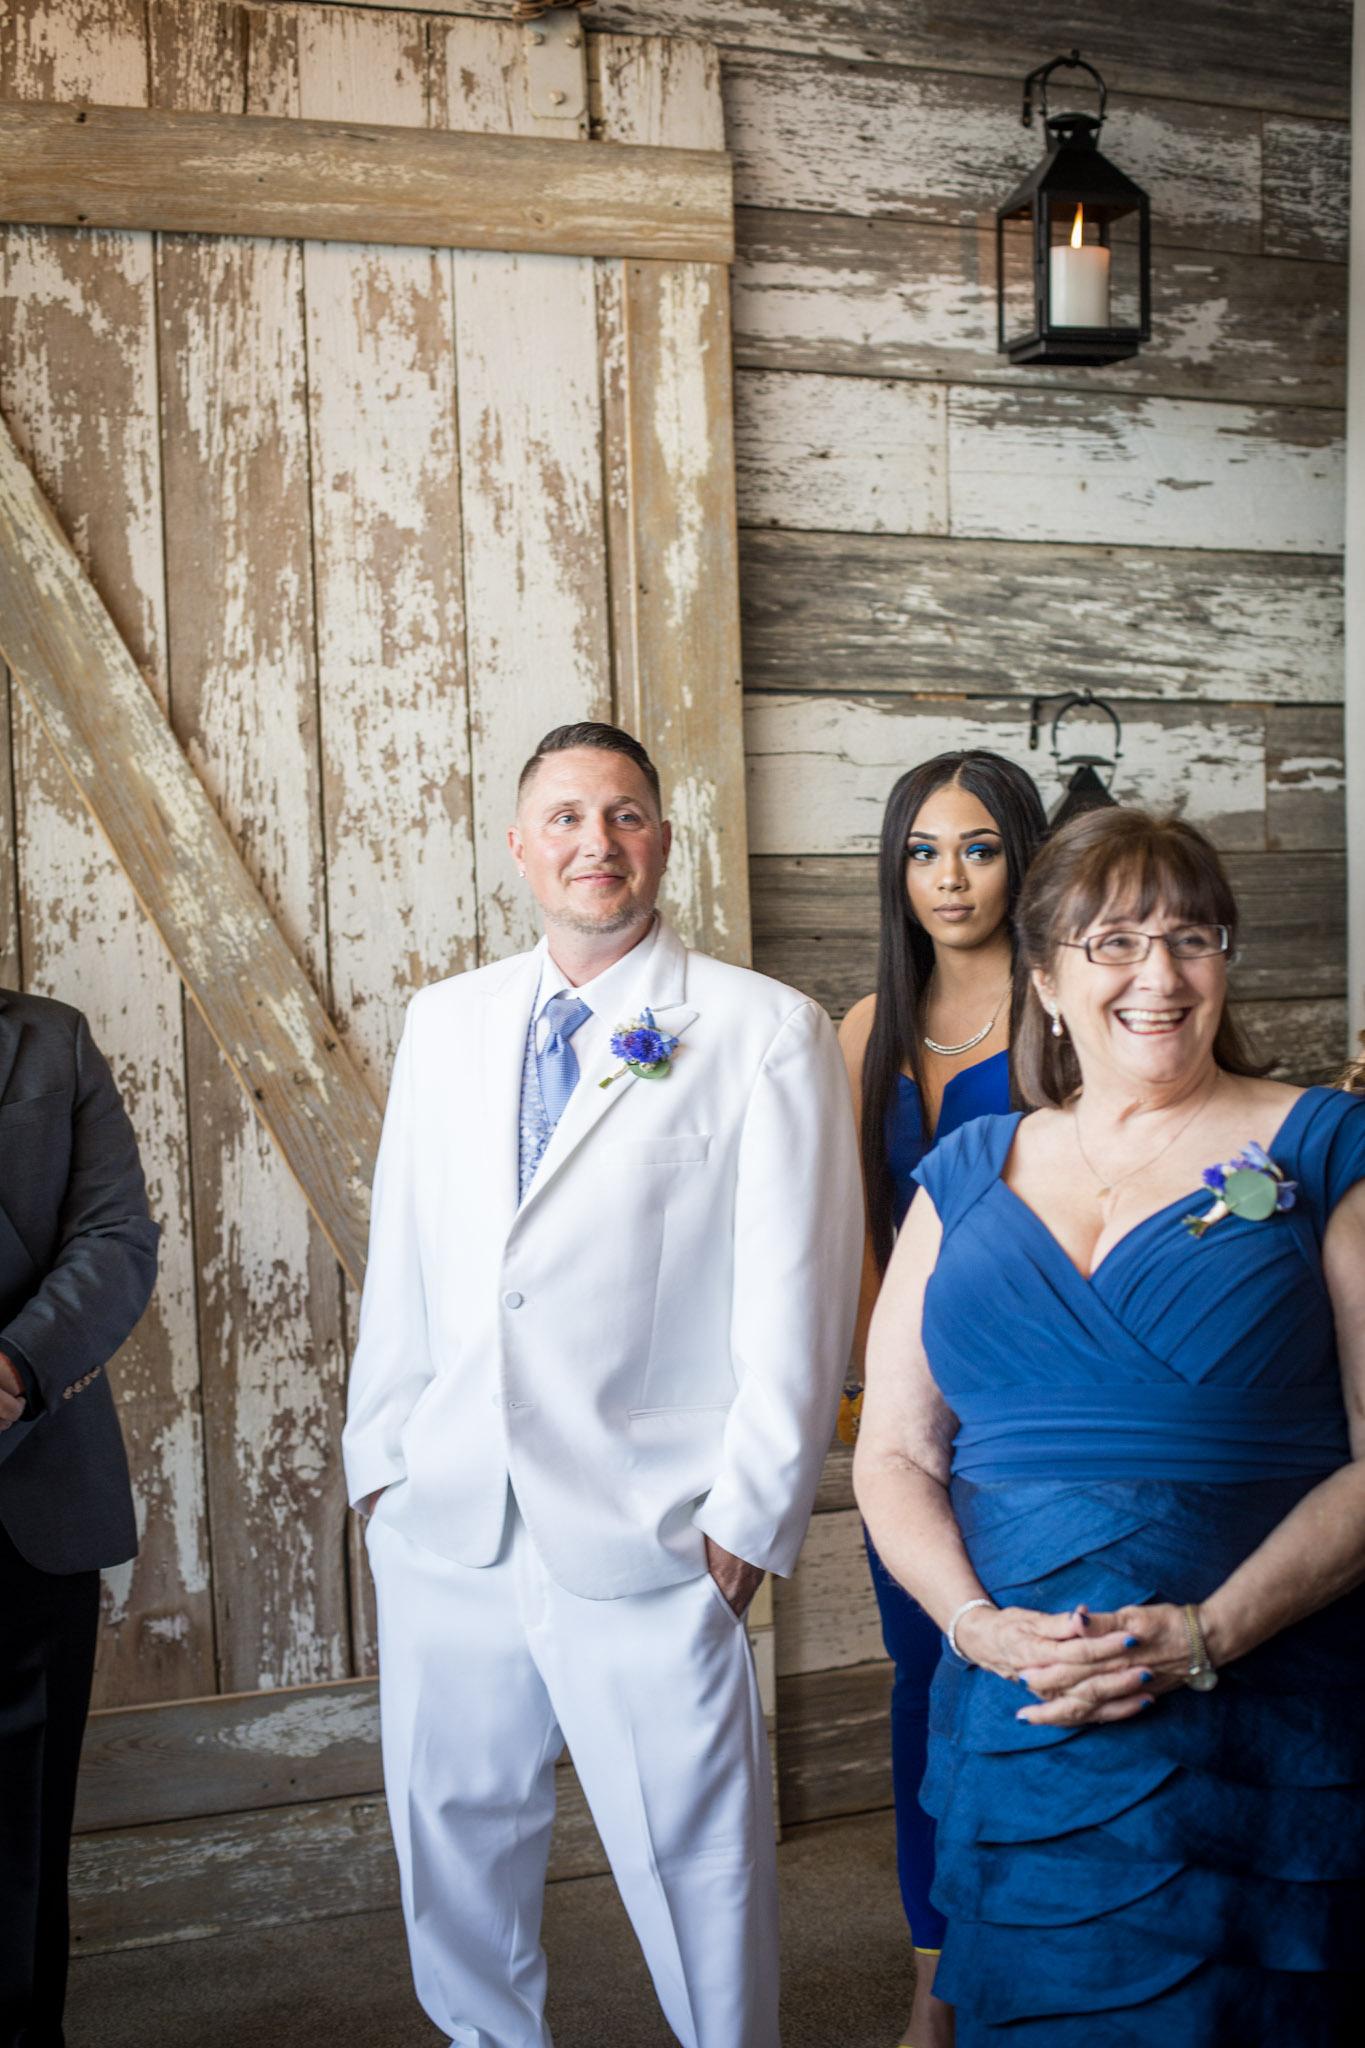 The_Vow_Exchange_Kansas_City_Small_Budget_Wedding_Venue_Mico&Daniel-062.jpg